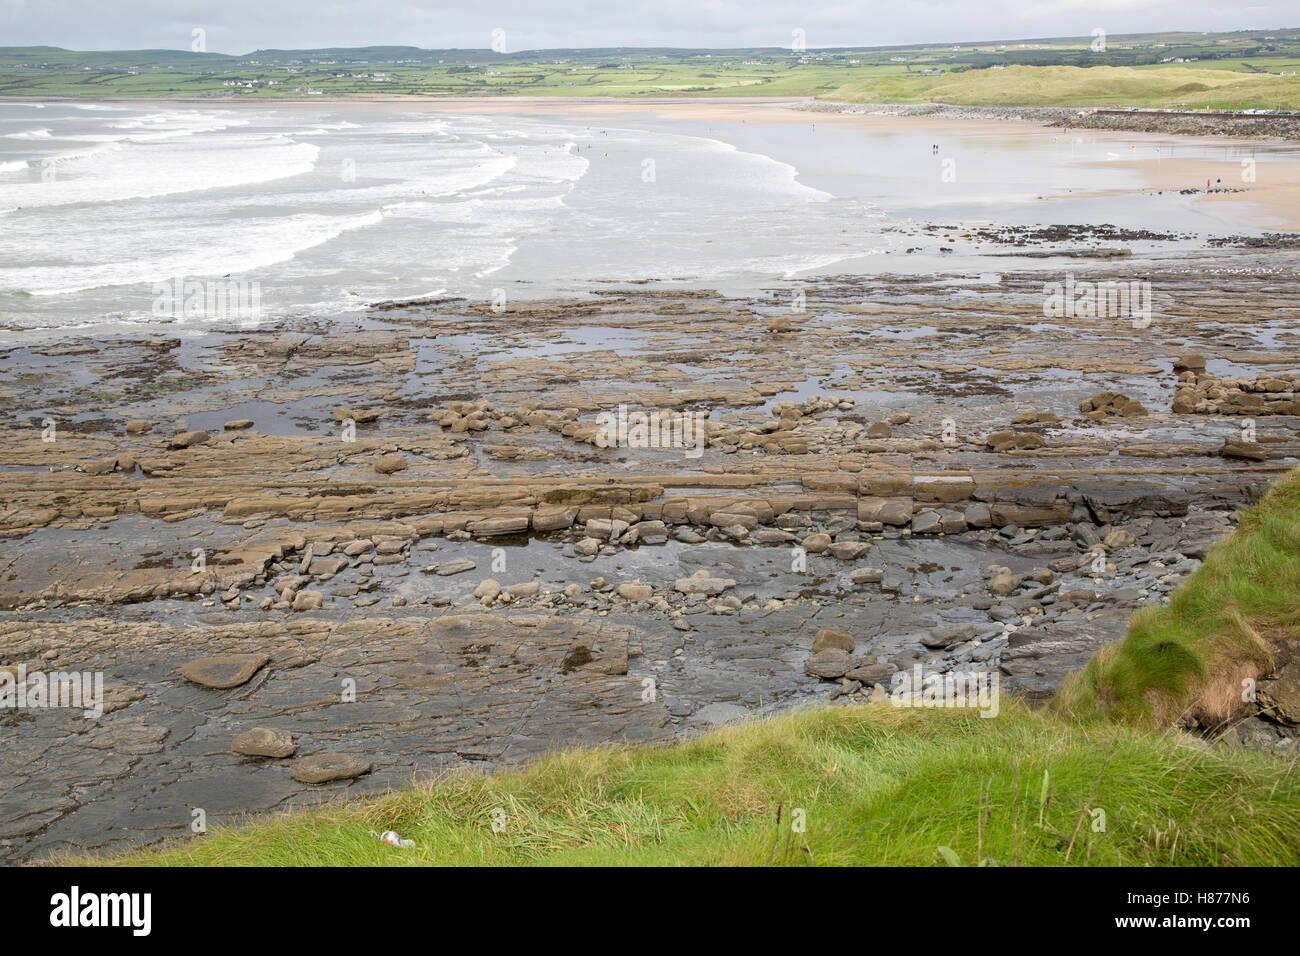 Lahinch Beach, Clare, Ireland, - Stock Image